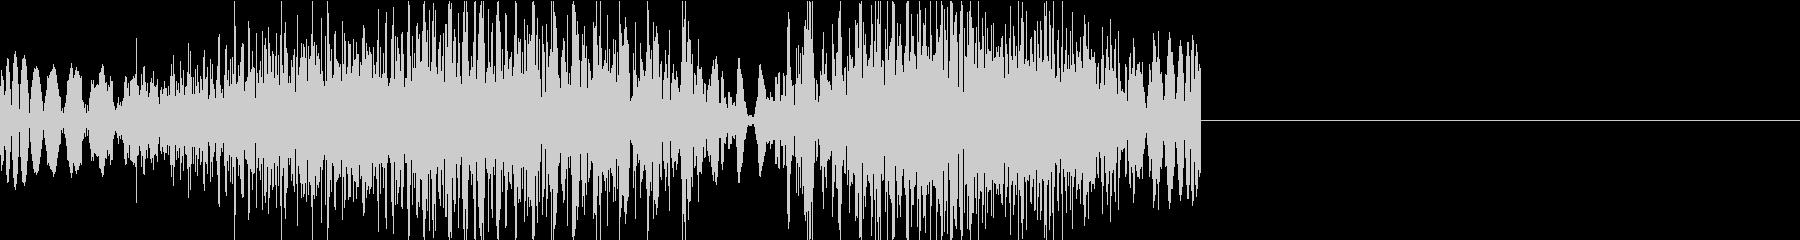 DJプレイ スクラッチ・ノイズ 316の未再生の波形